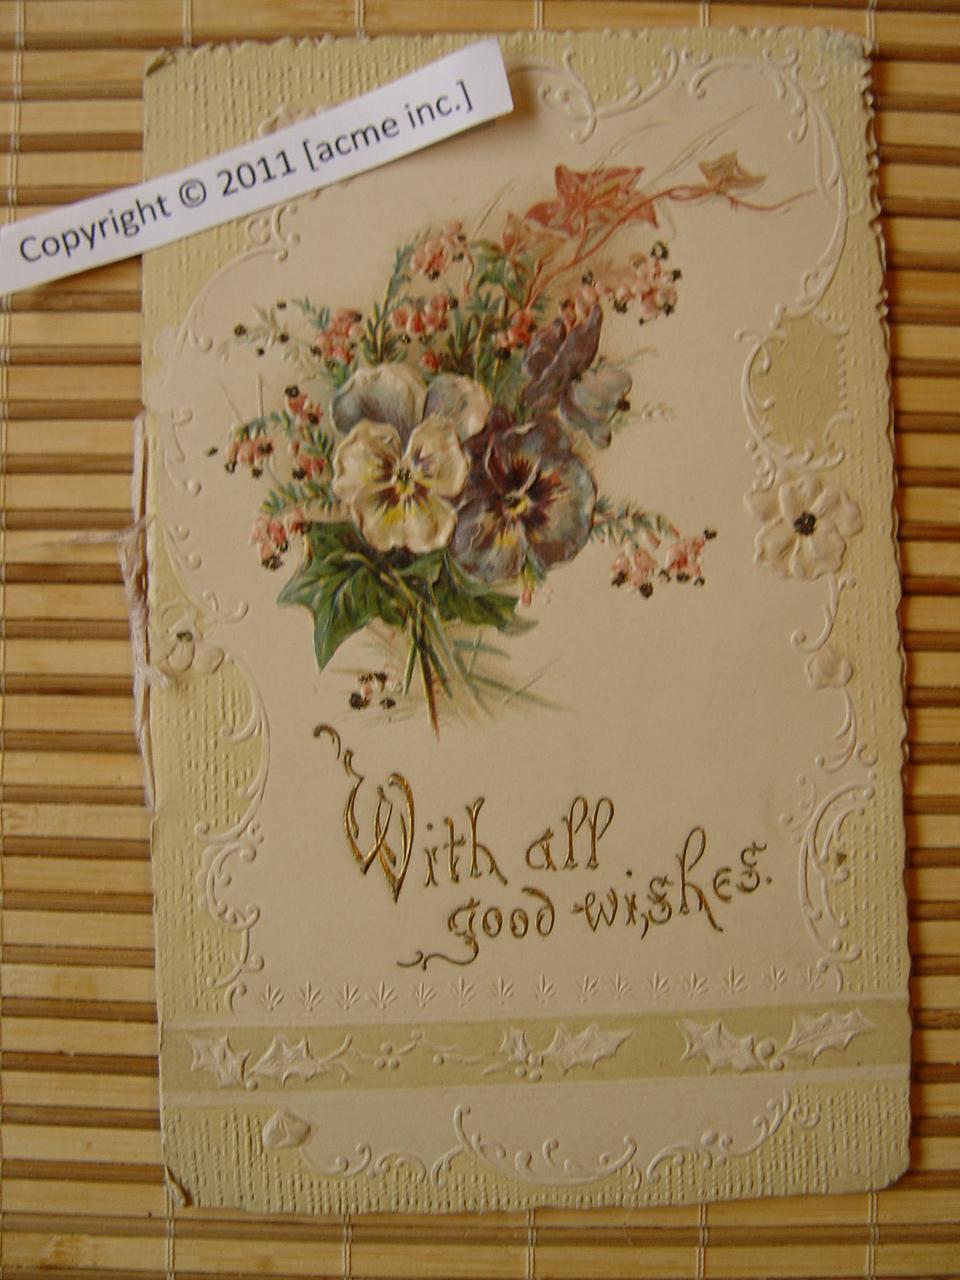 http://www.acme-inc.co.uk/greetingscards/DSC05497.jpg